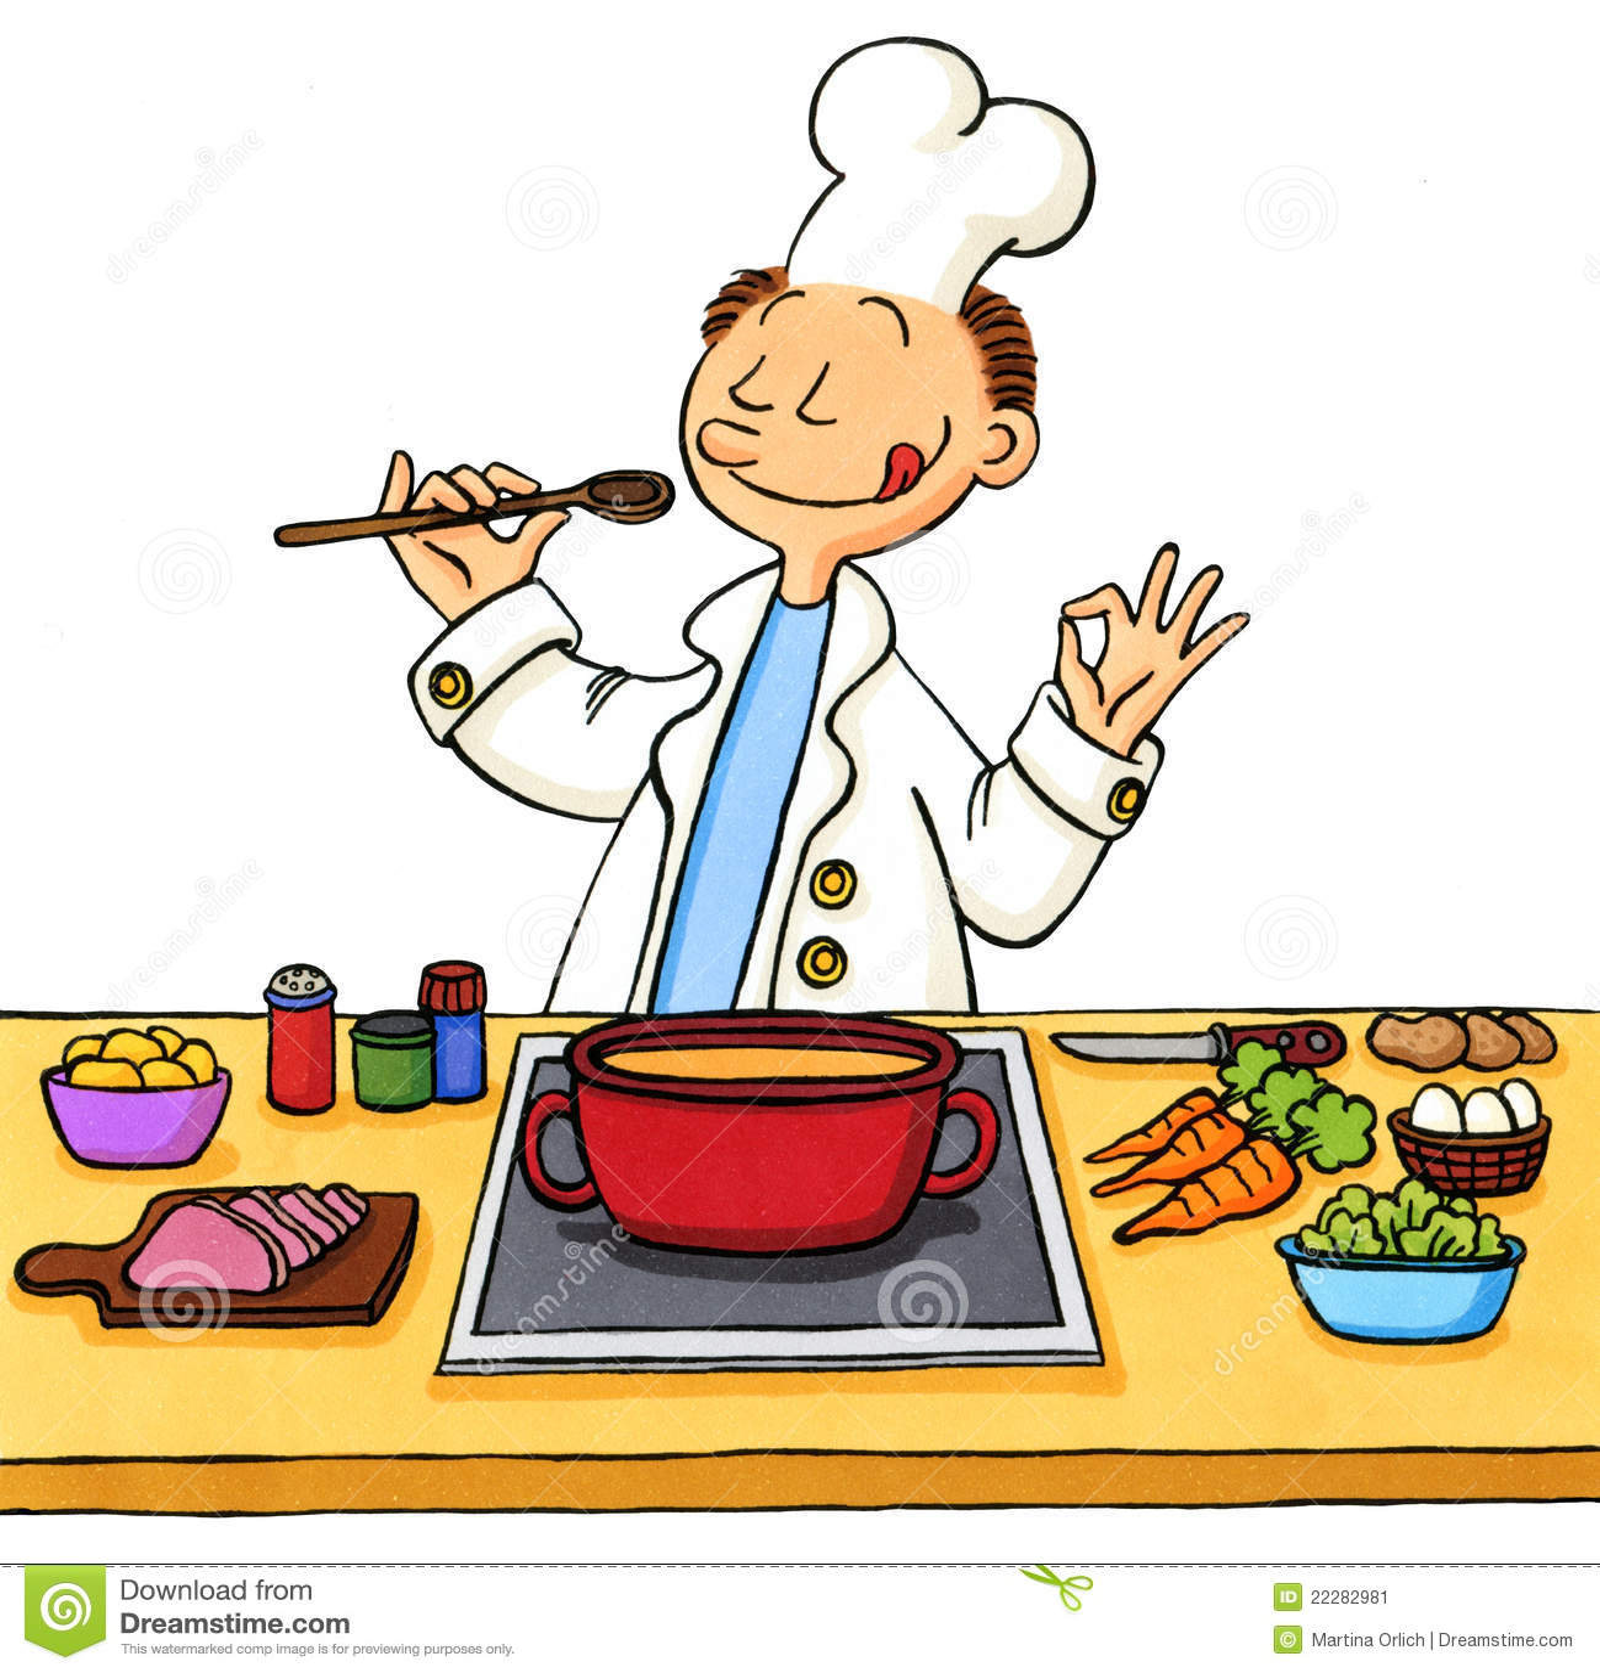 Dessin anim d 39 un cuisinier dans la cuisine image stock for Dessin cuisine